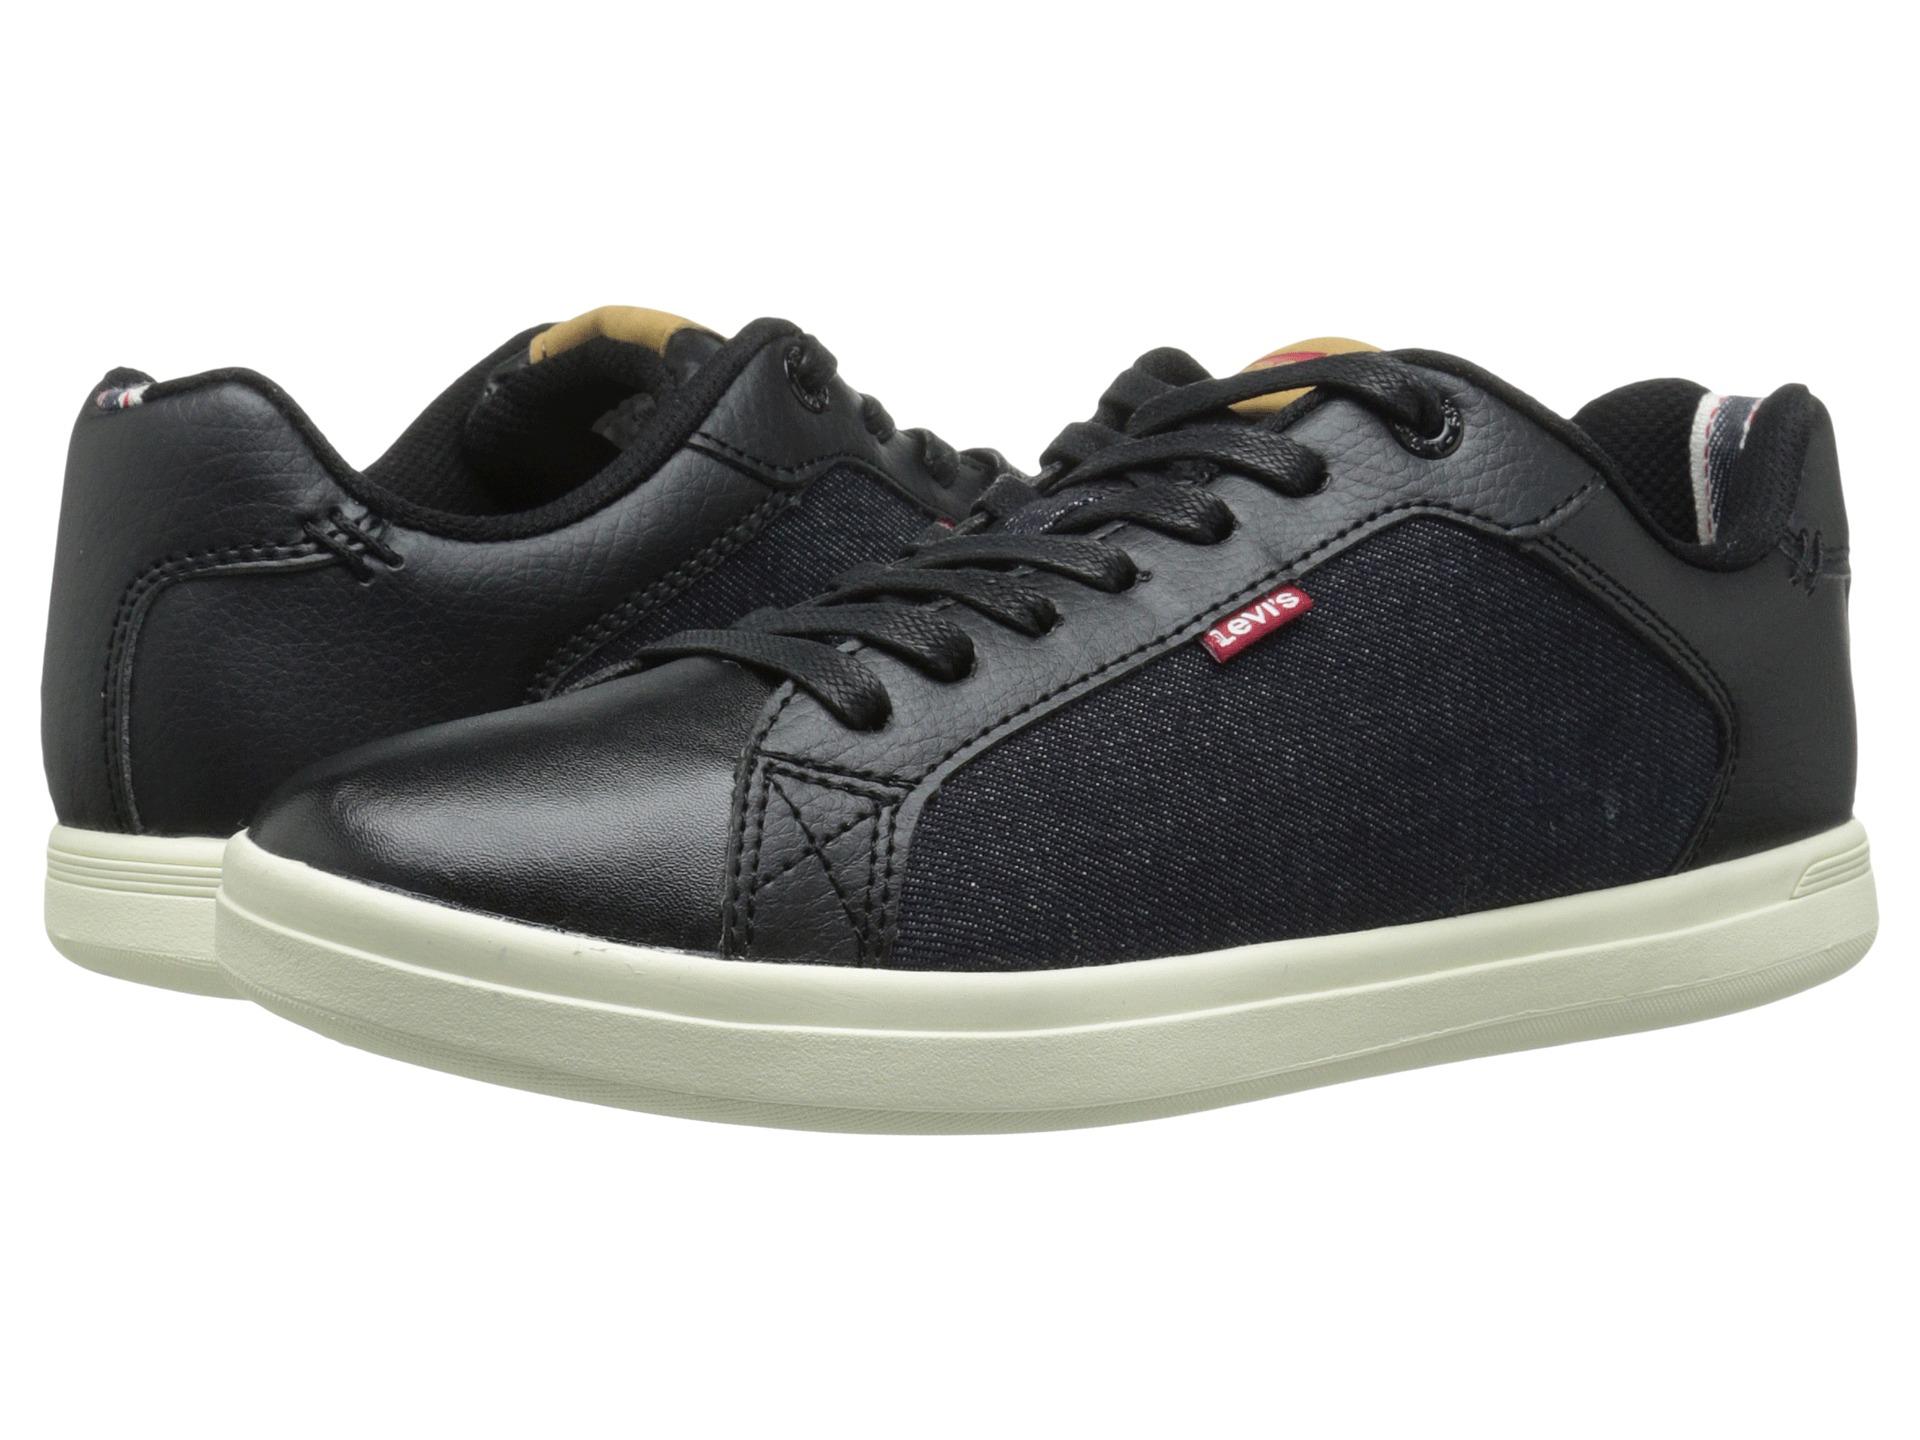 levi s 174 shoes westwood denim navy black zappos free